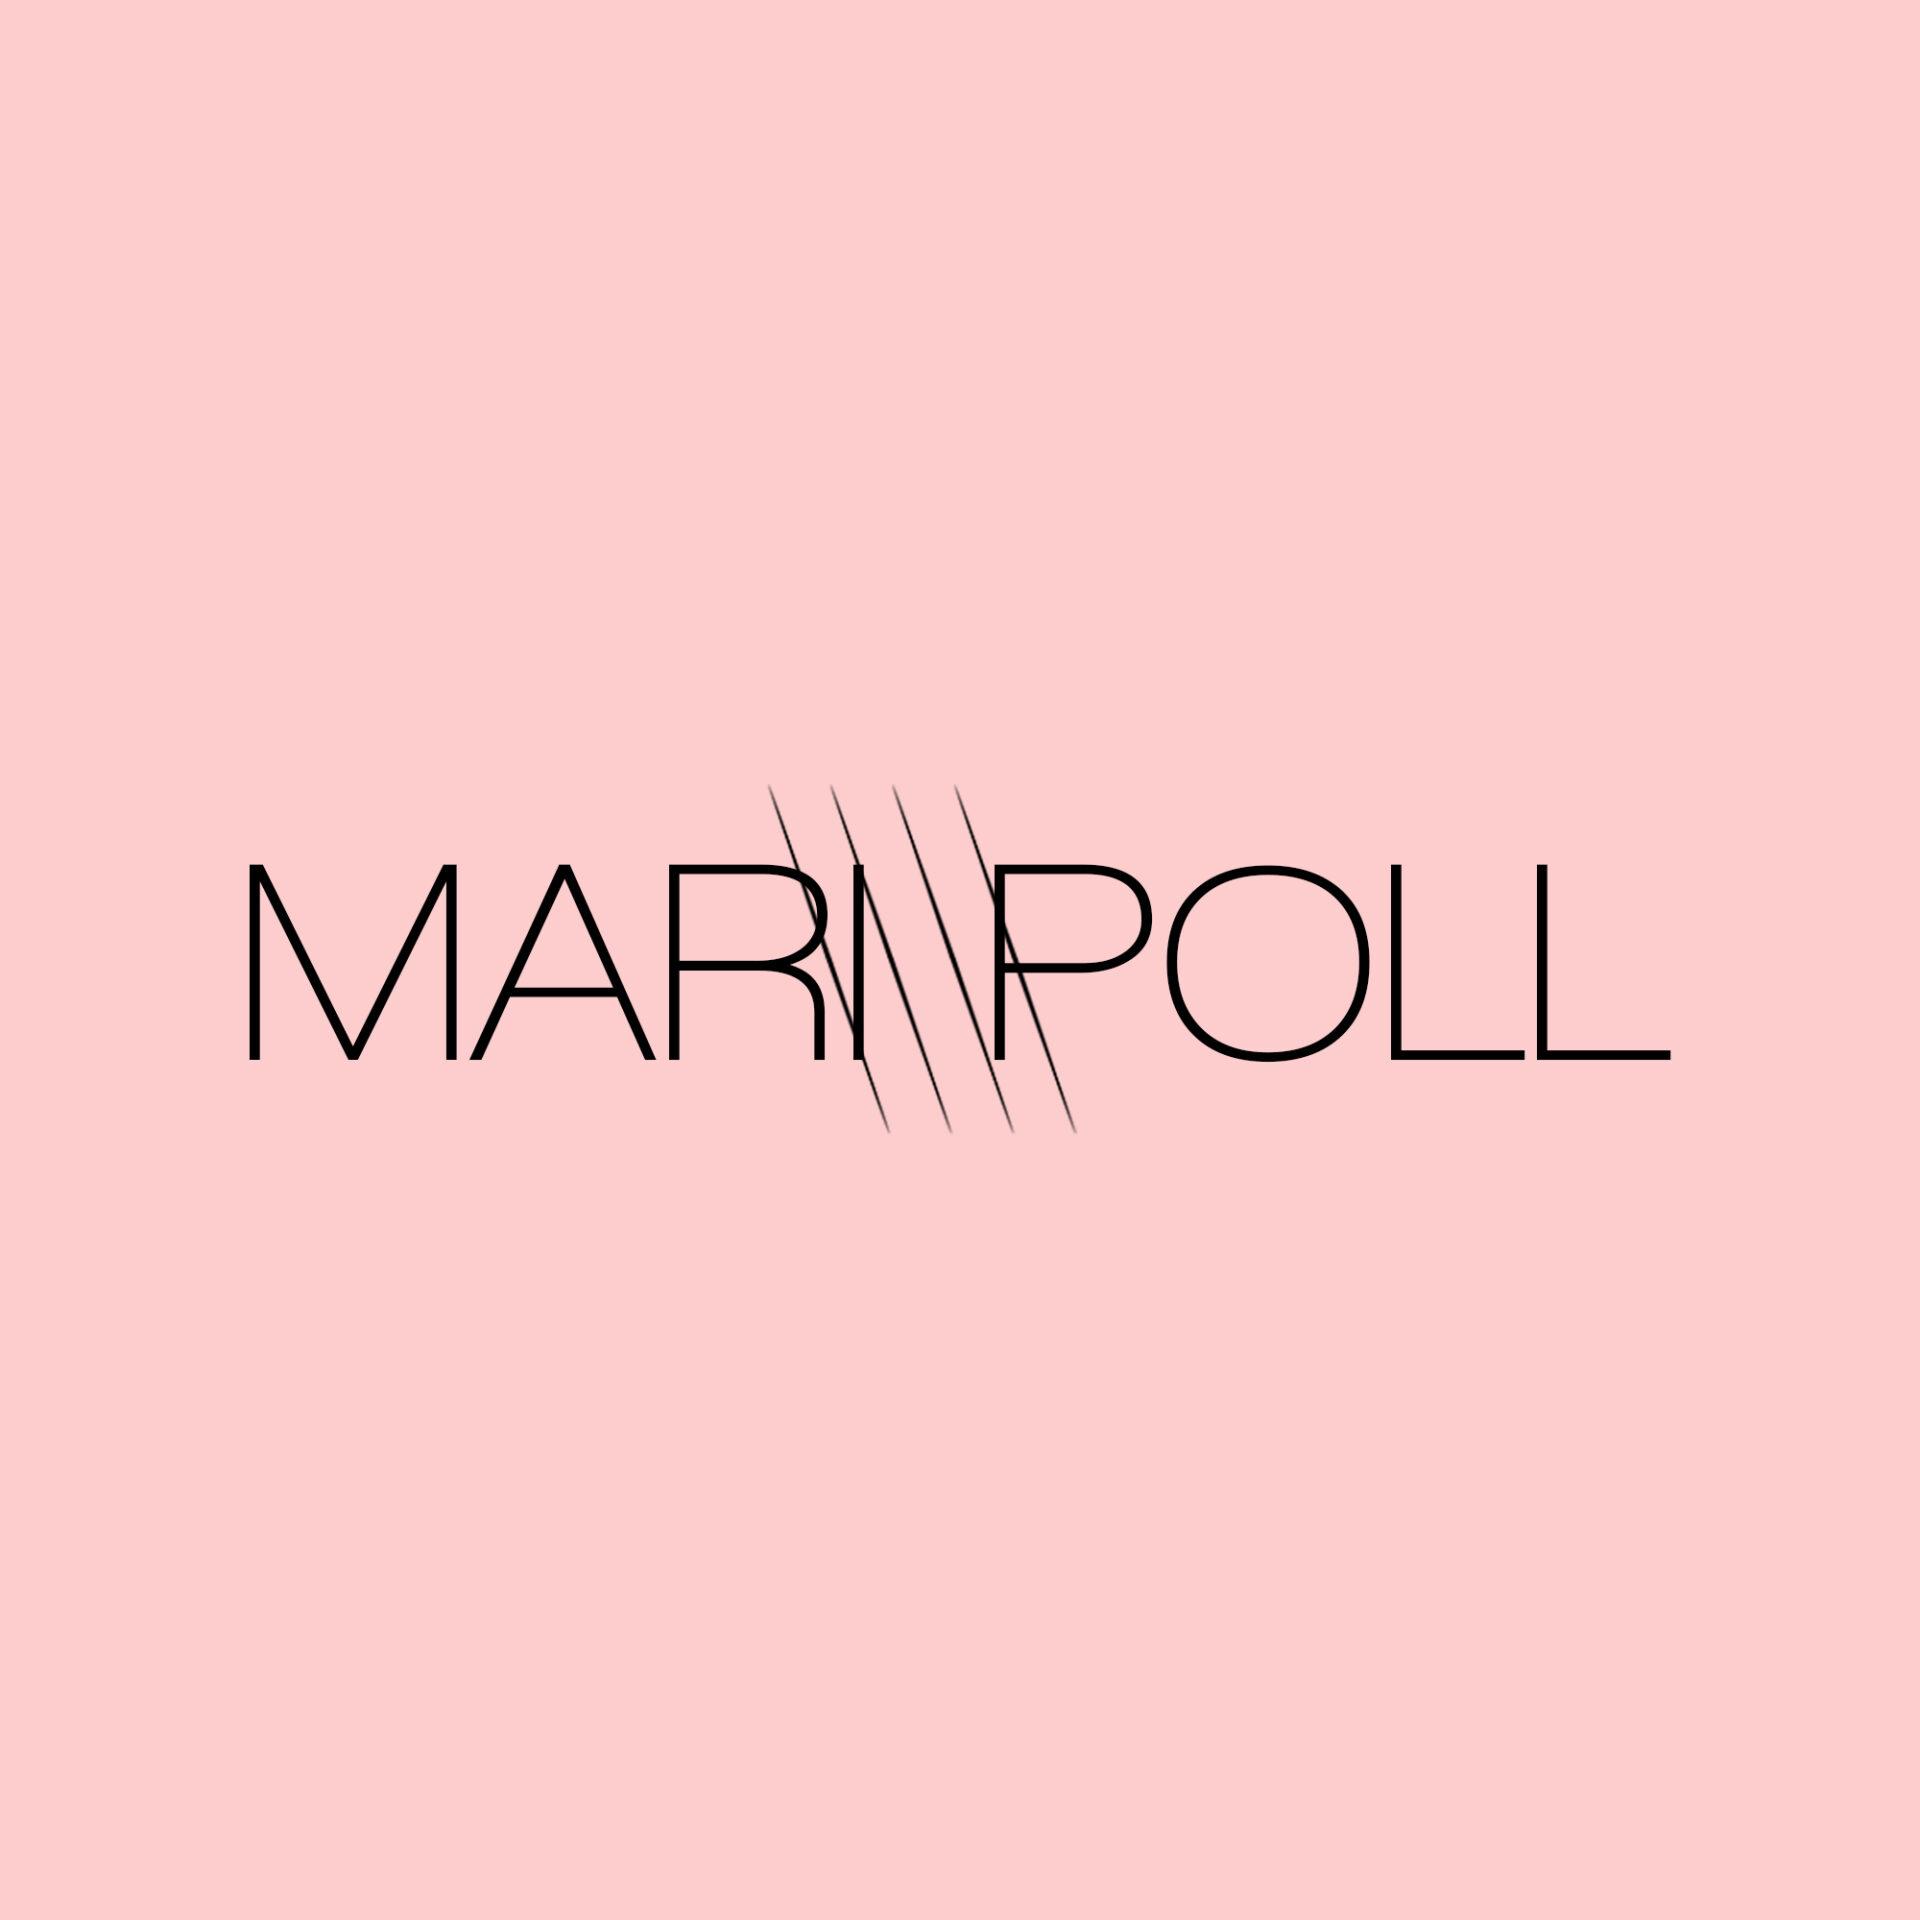 mari poll madoro portfolio